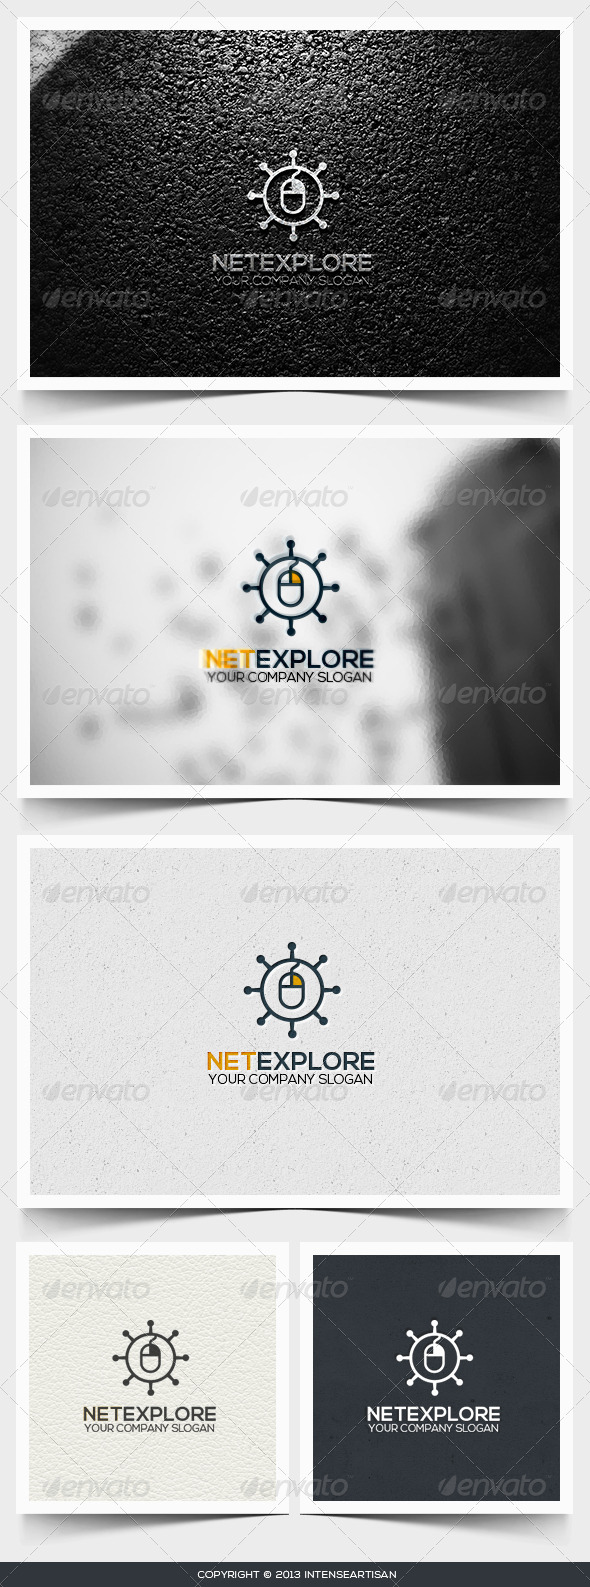 Net Explore Logo Template - Objects Logo Templates